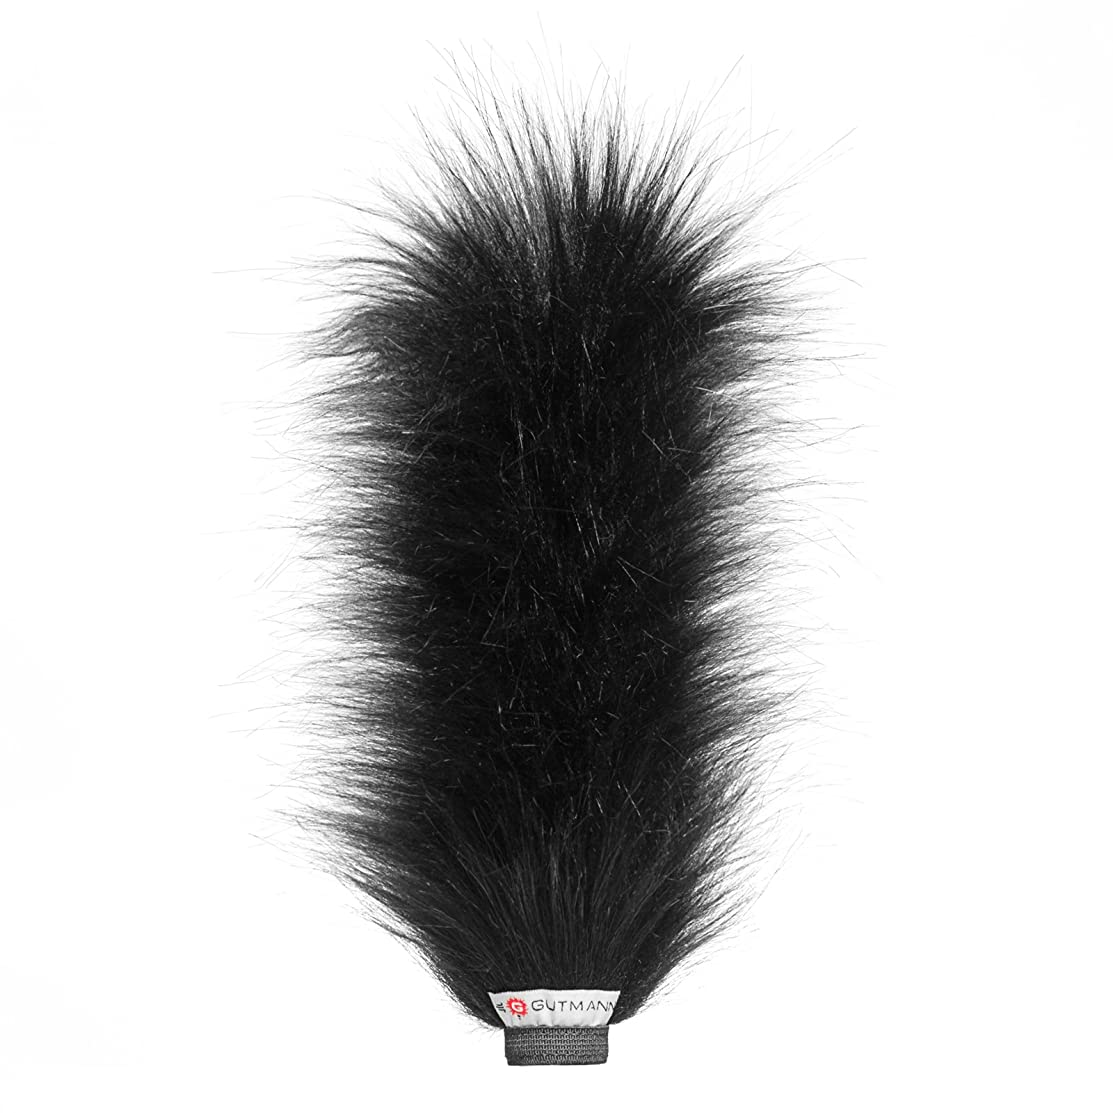 Gutmann Fur Microphone Windshield Windscreen for Sennheiser E 614